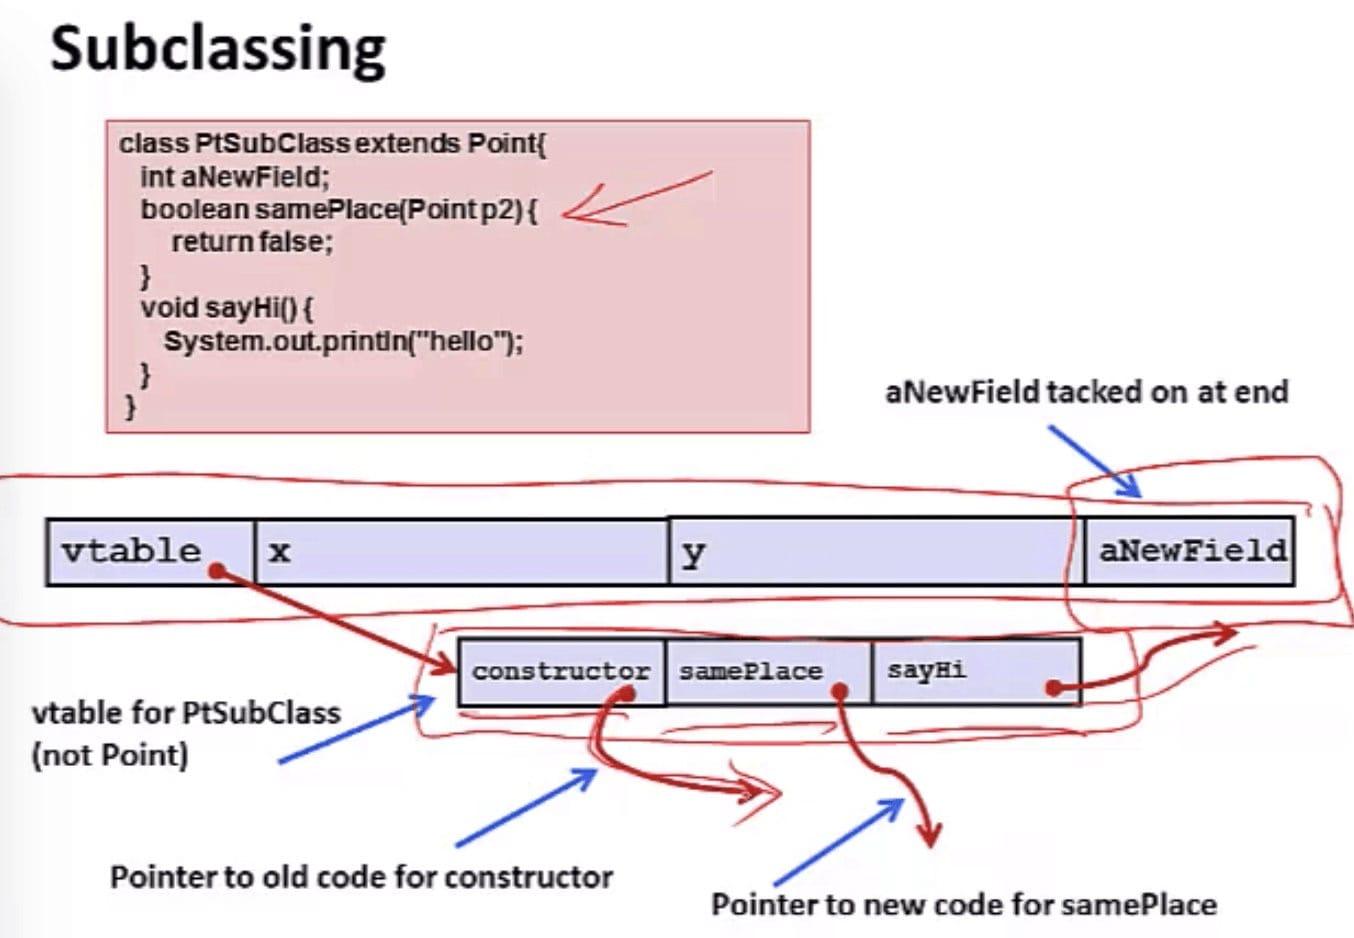 Subclassing Java (CSE 351 - Java vs. C, Video 2: Implementation)